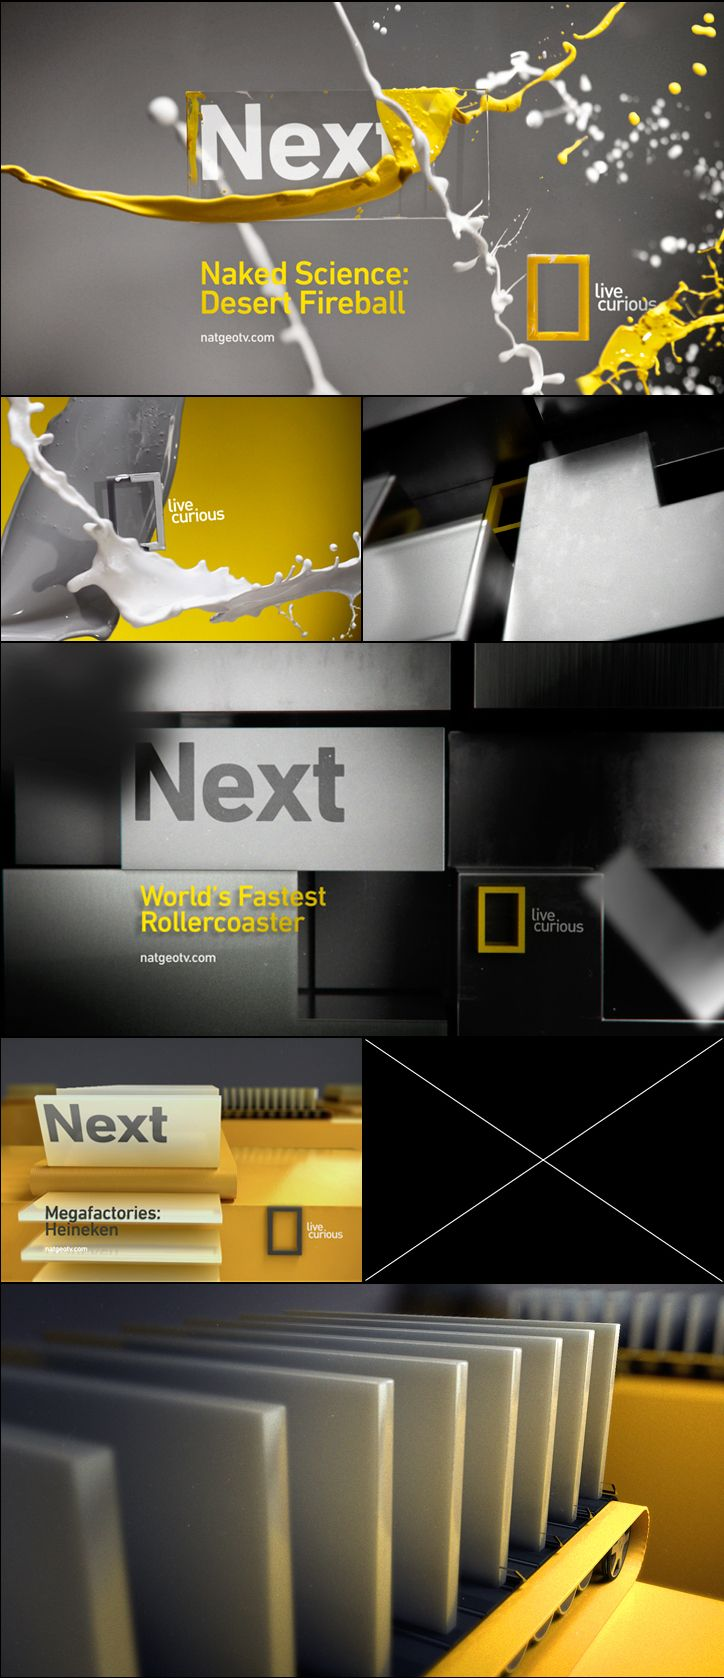 Superestudio - Nat Geo pitch